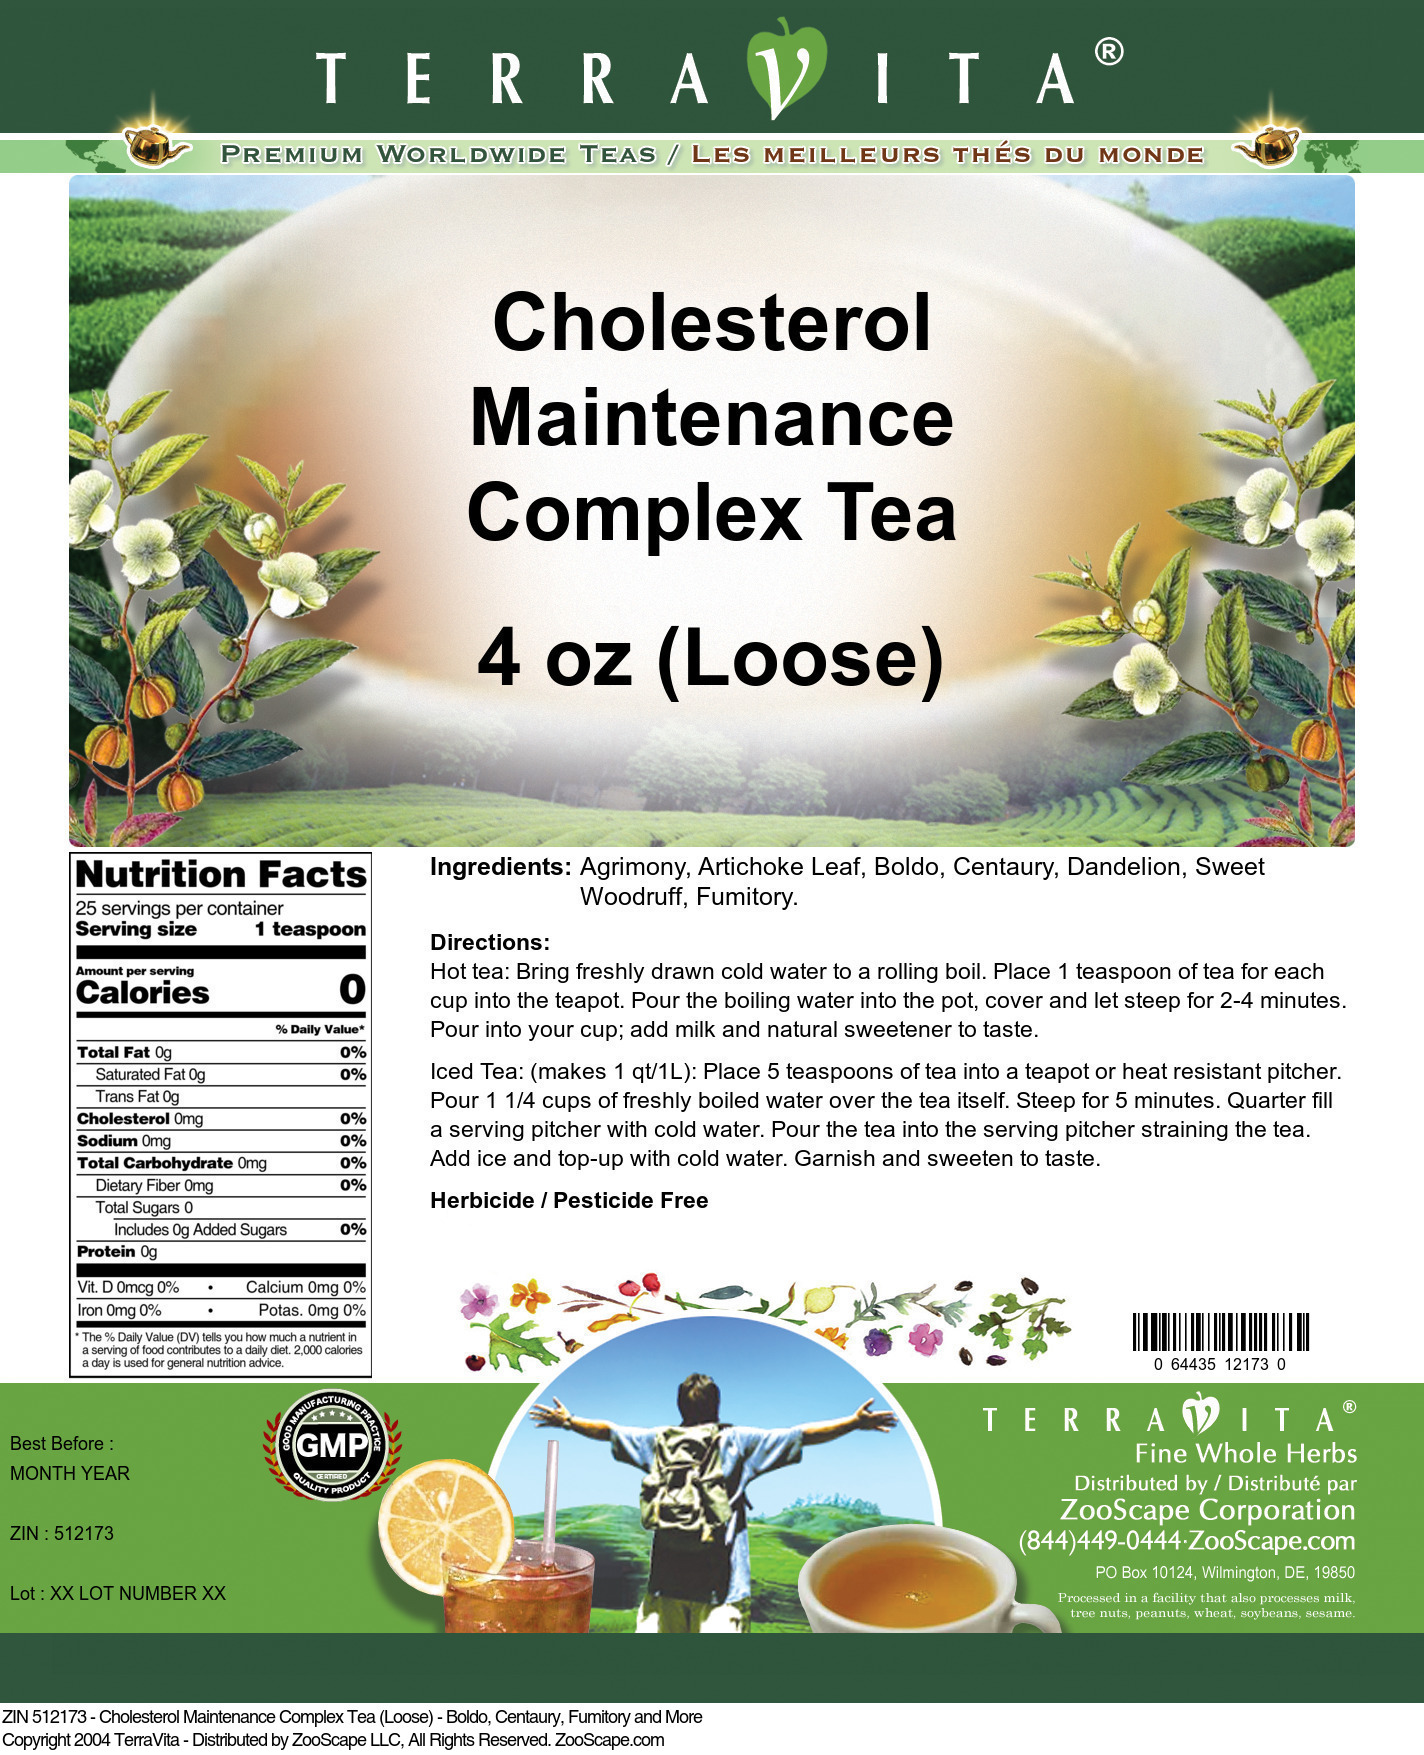 Cholesterol Maintenance Complex Tea (Loose) - Boldo, Centaury, Fumitory and More